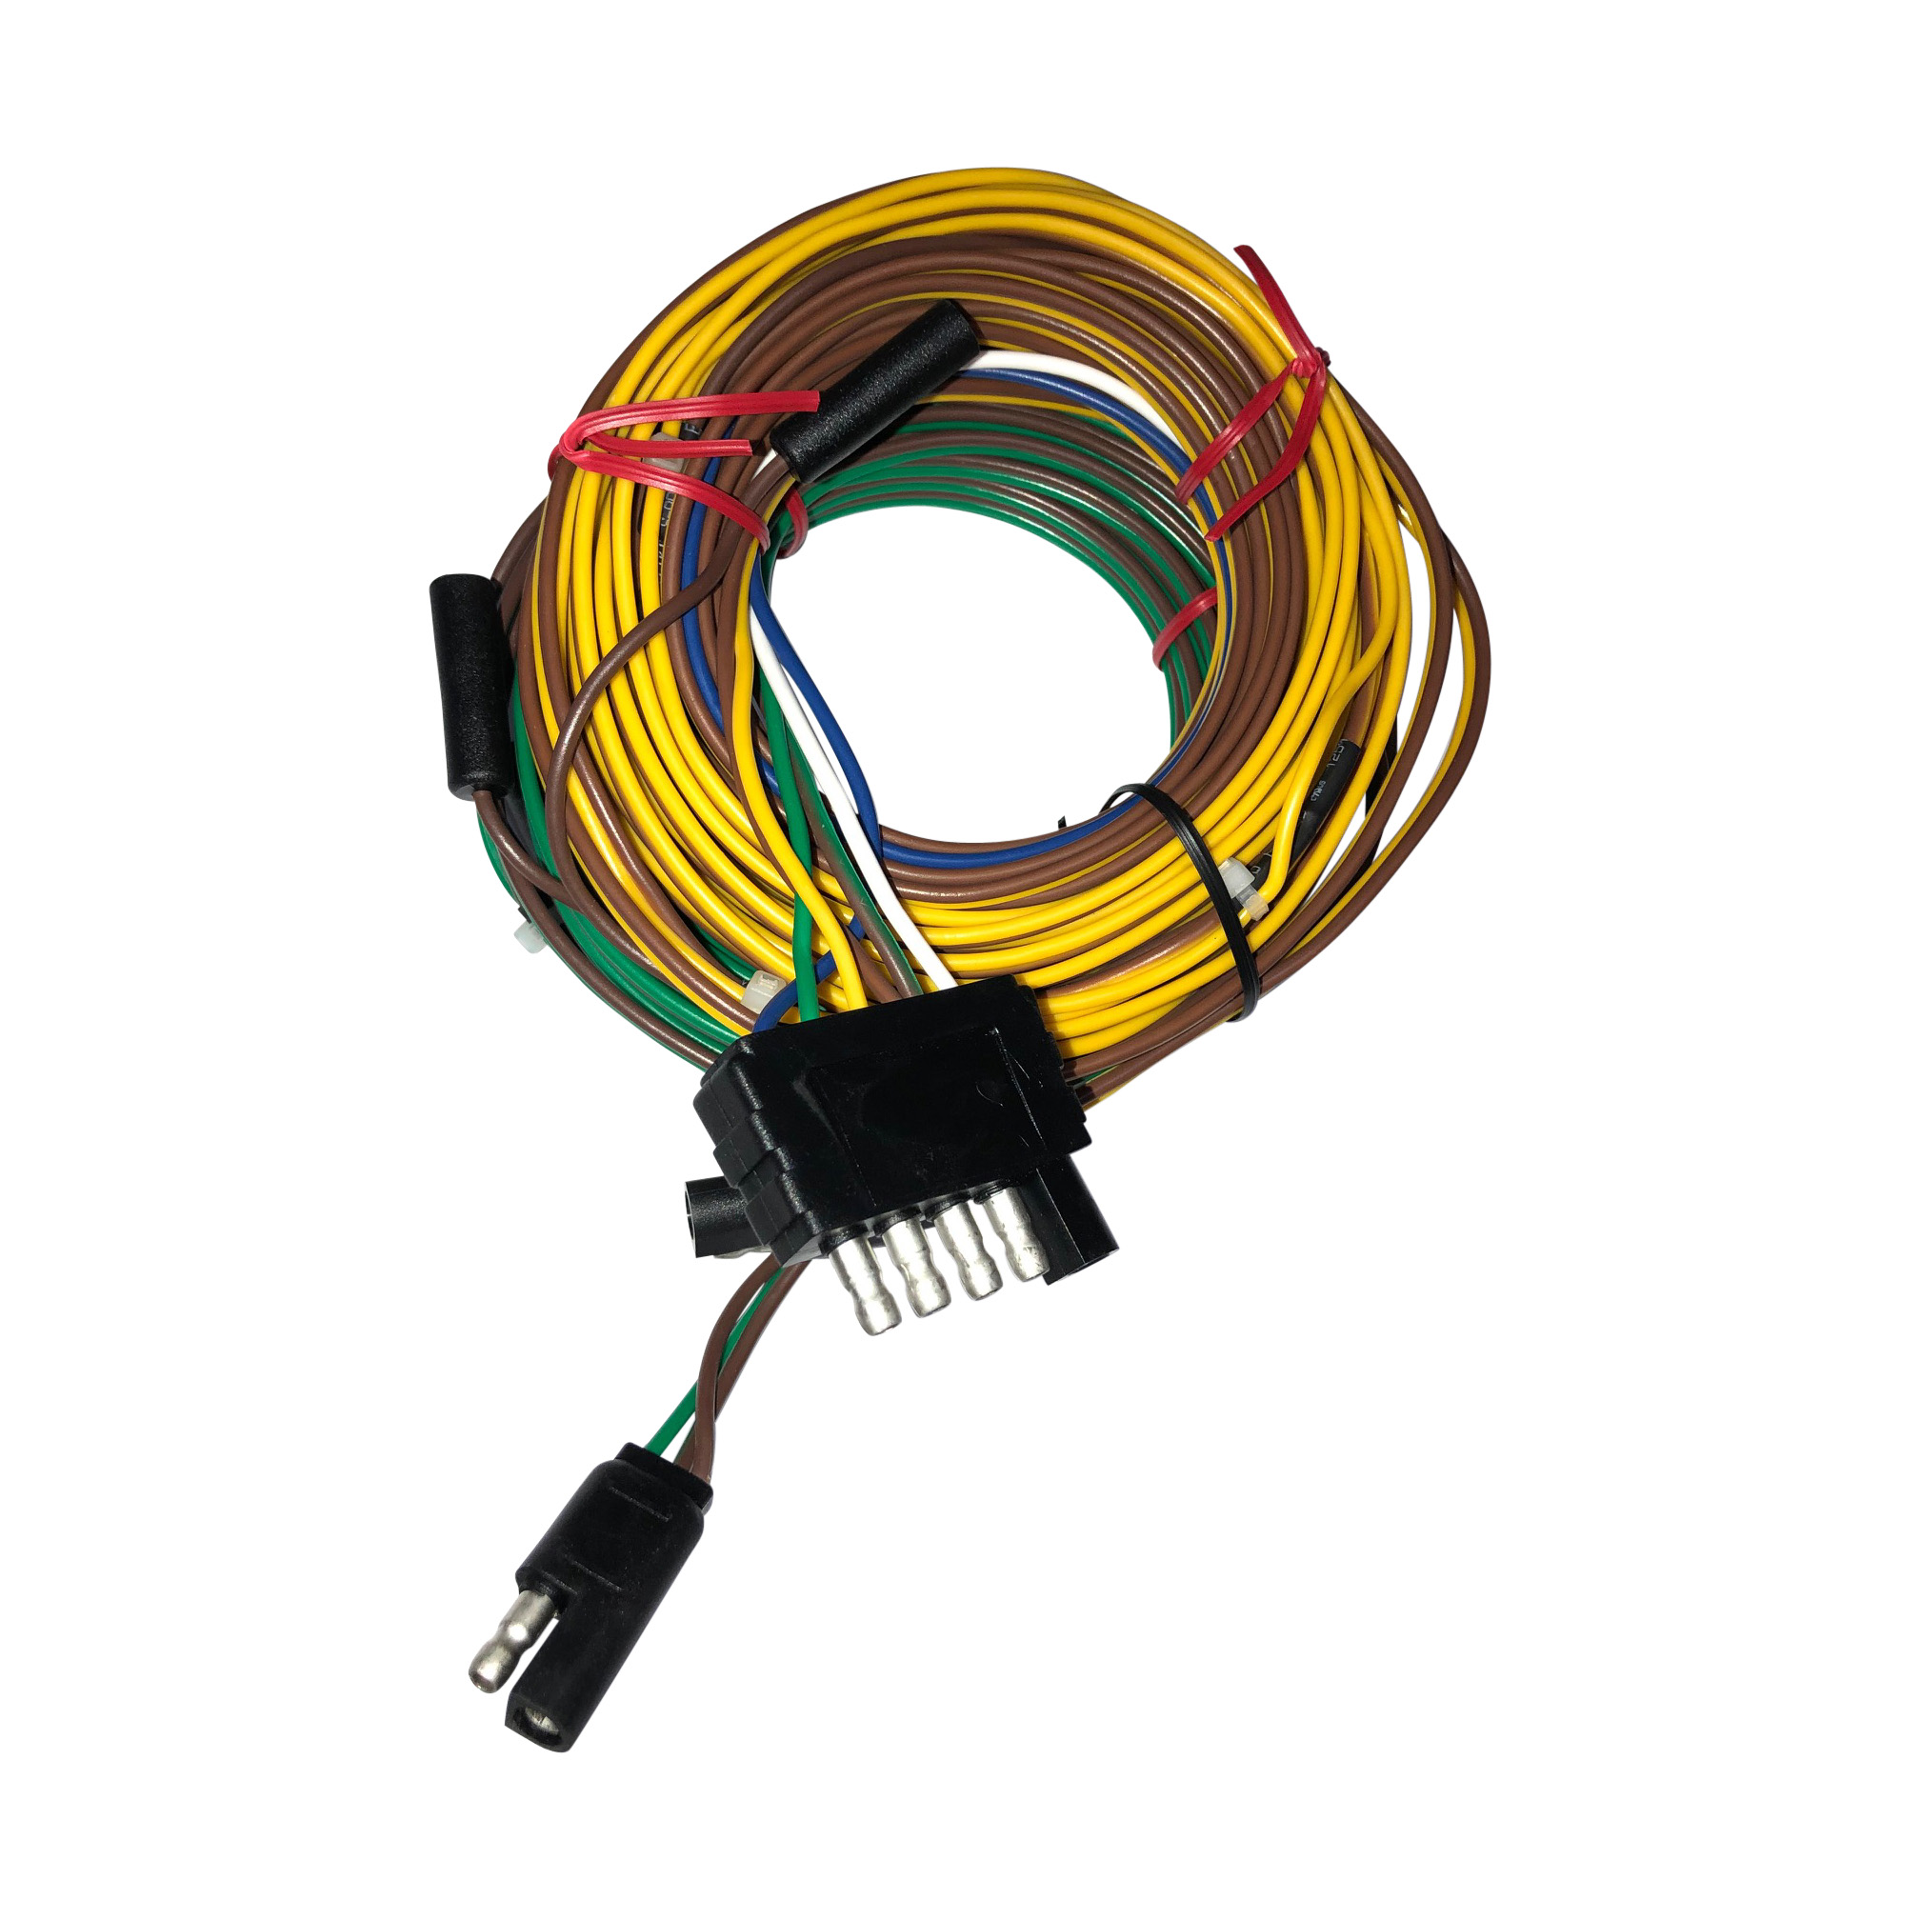 Wire Harness 336″ 5 Wire Flat Connector | Venture TrailersVenture Trailers